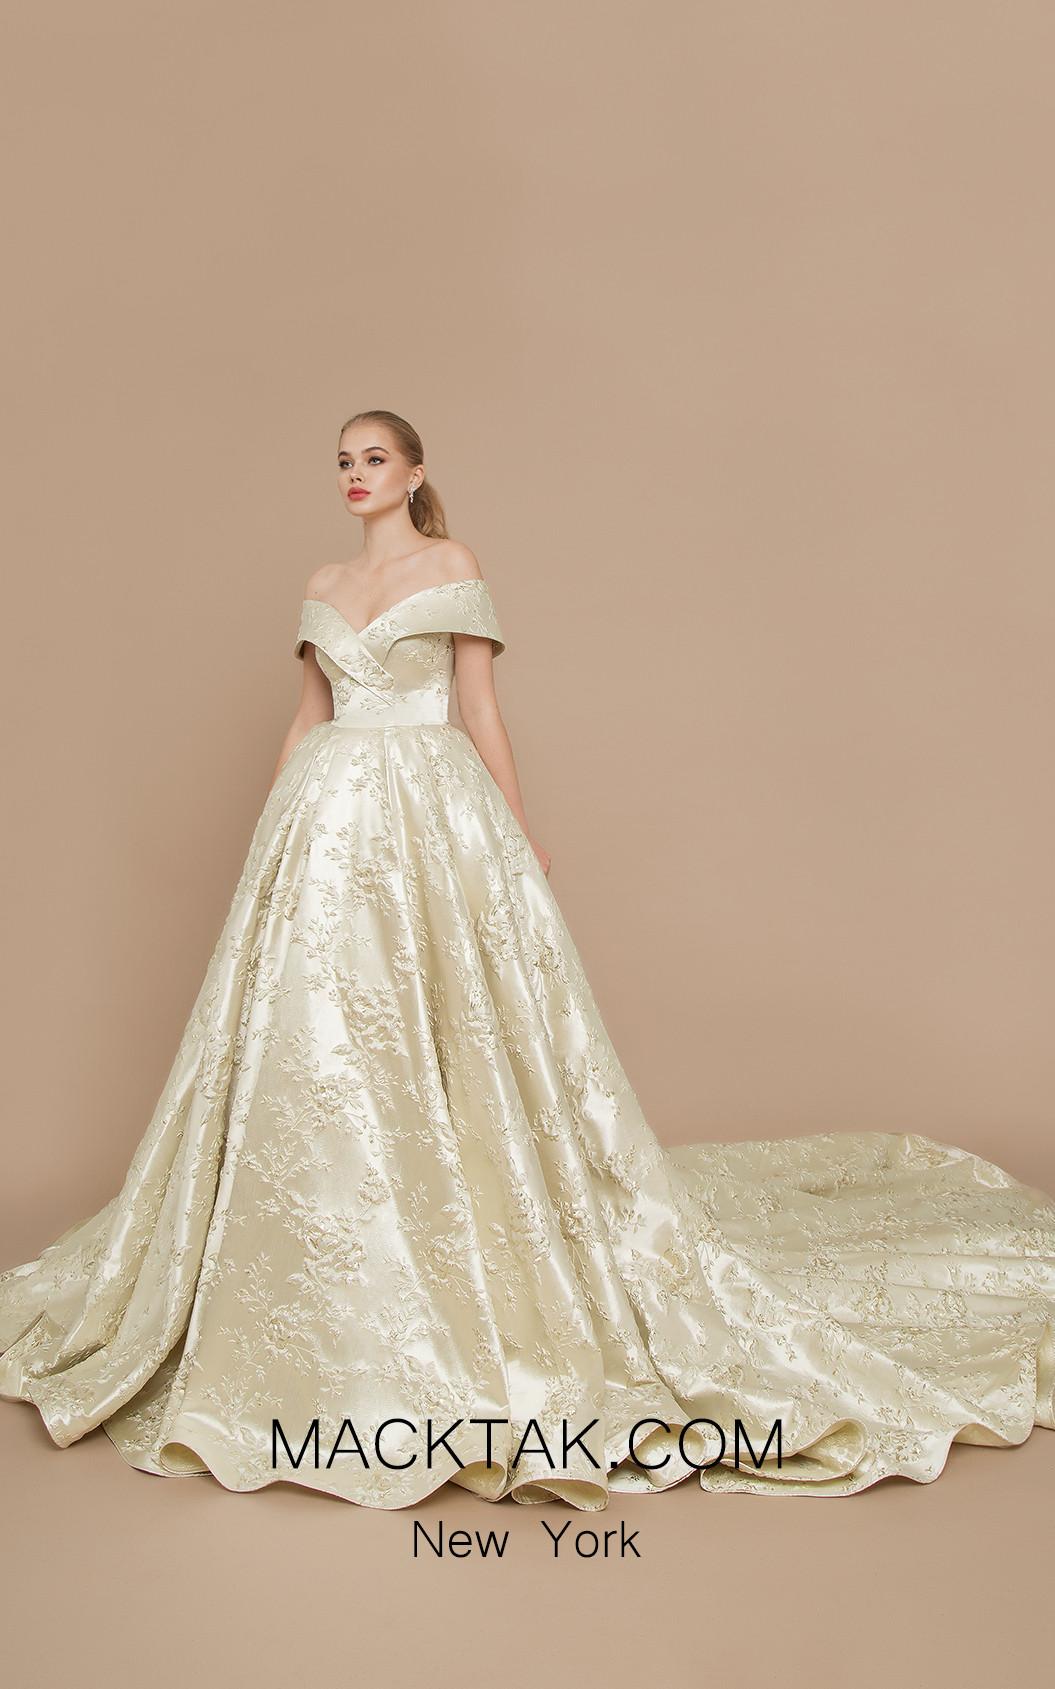 Ricca Sposa Marchesa Gold Ivory Front Dress